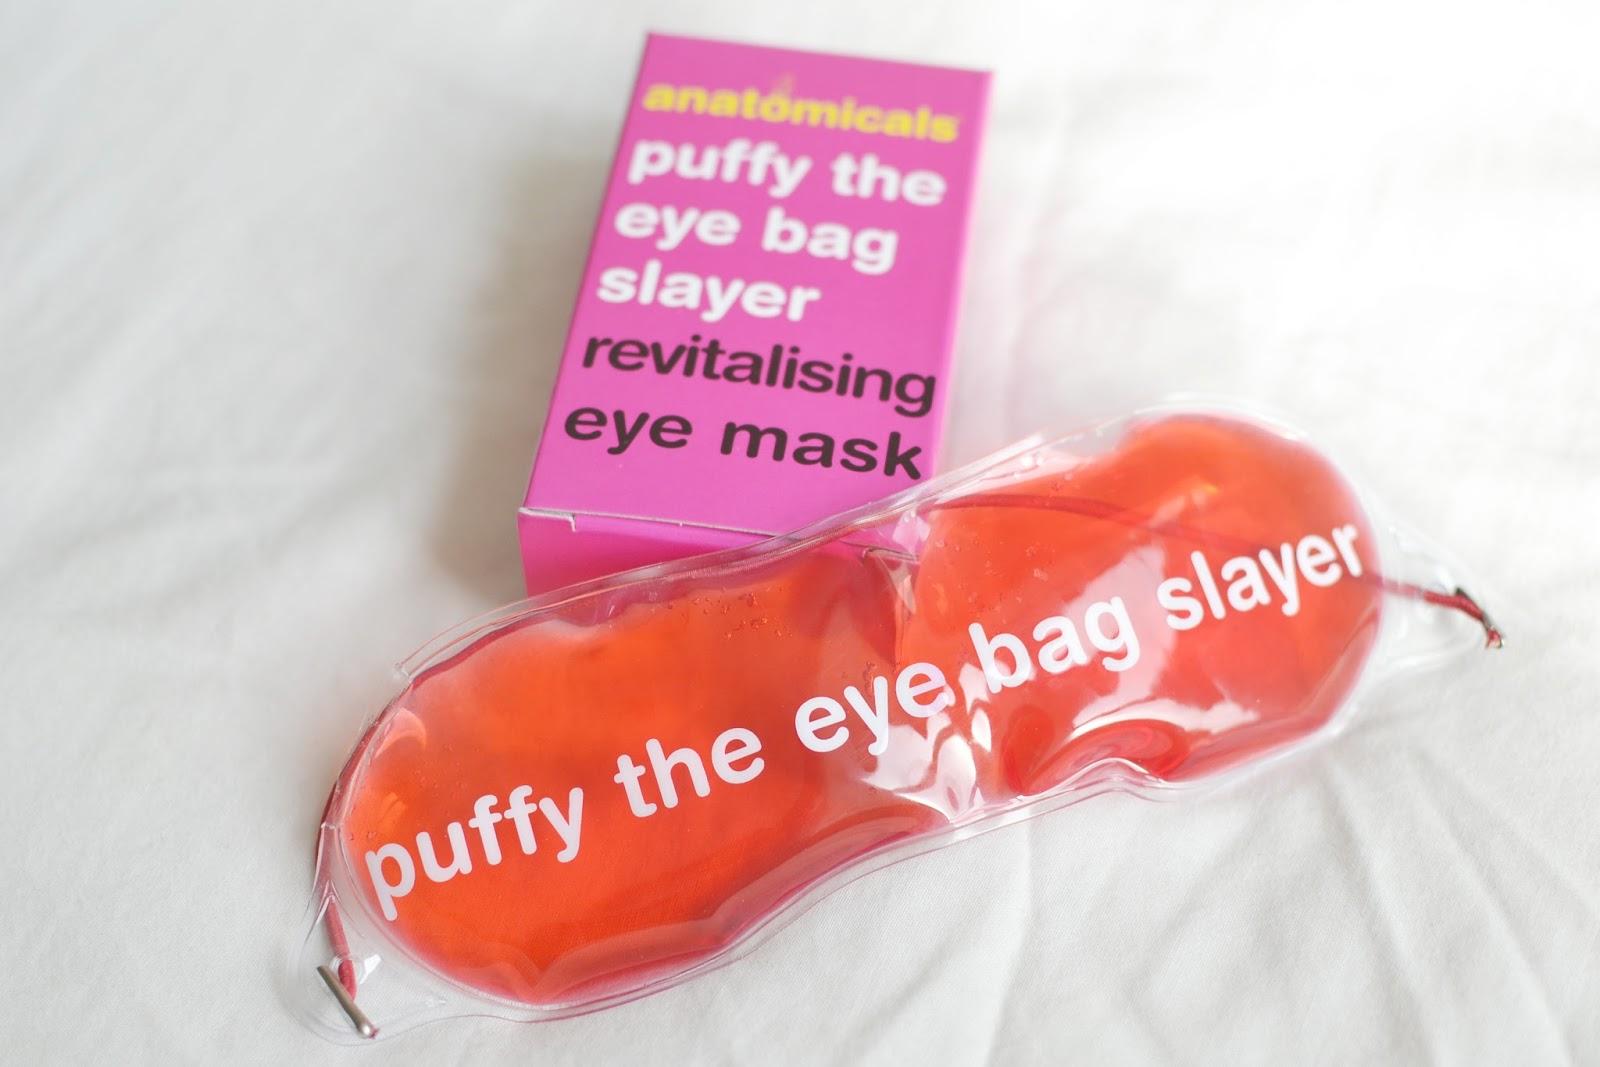 affordable eye mask, eye mask